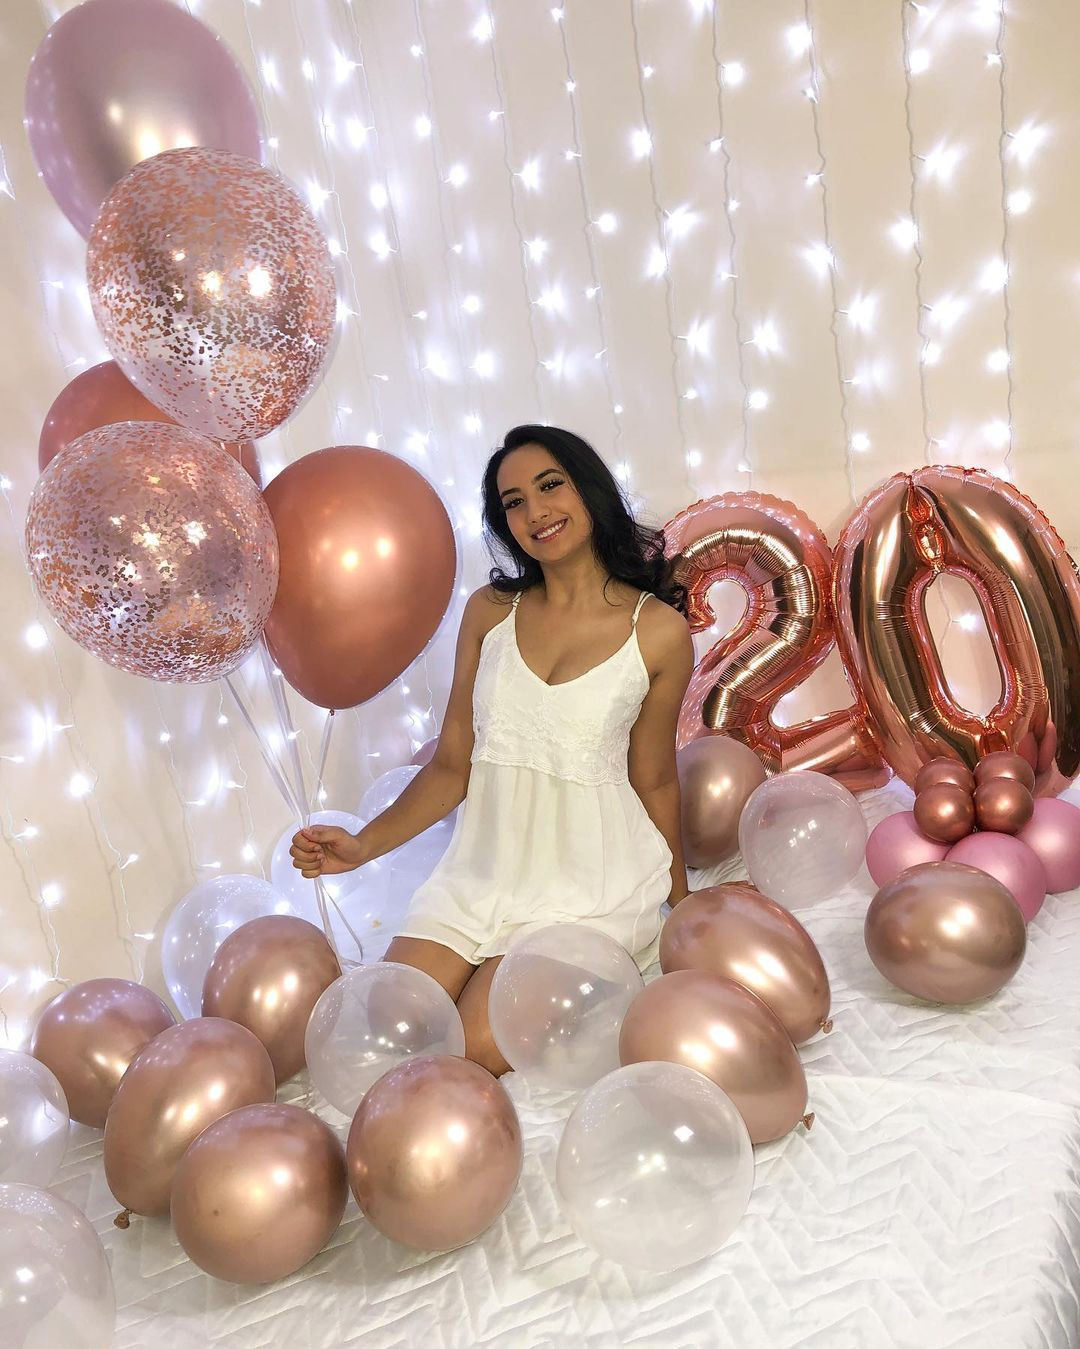 sandy menezes, miss grande sao paulo mundo 2019. - Página 5 Fmacfe10